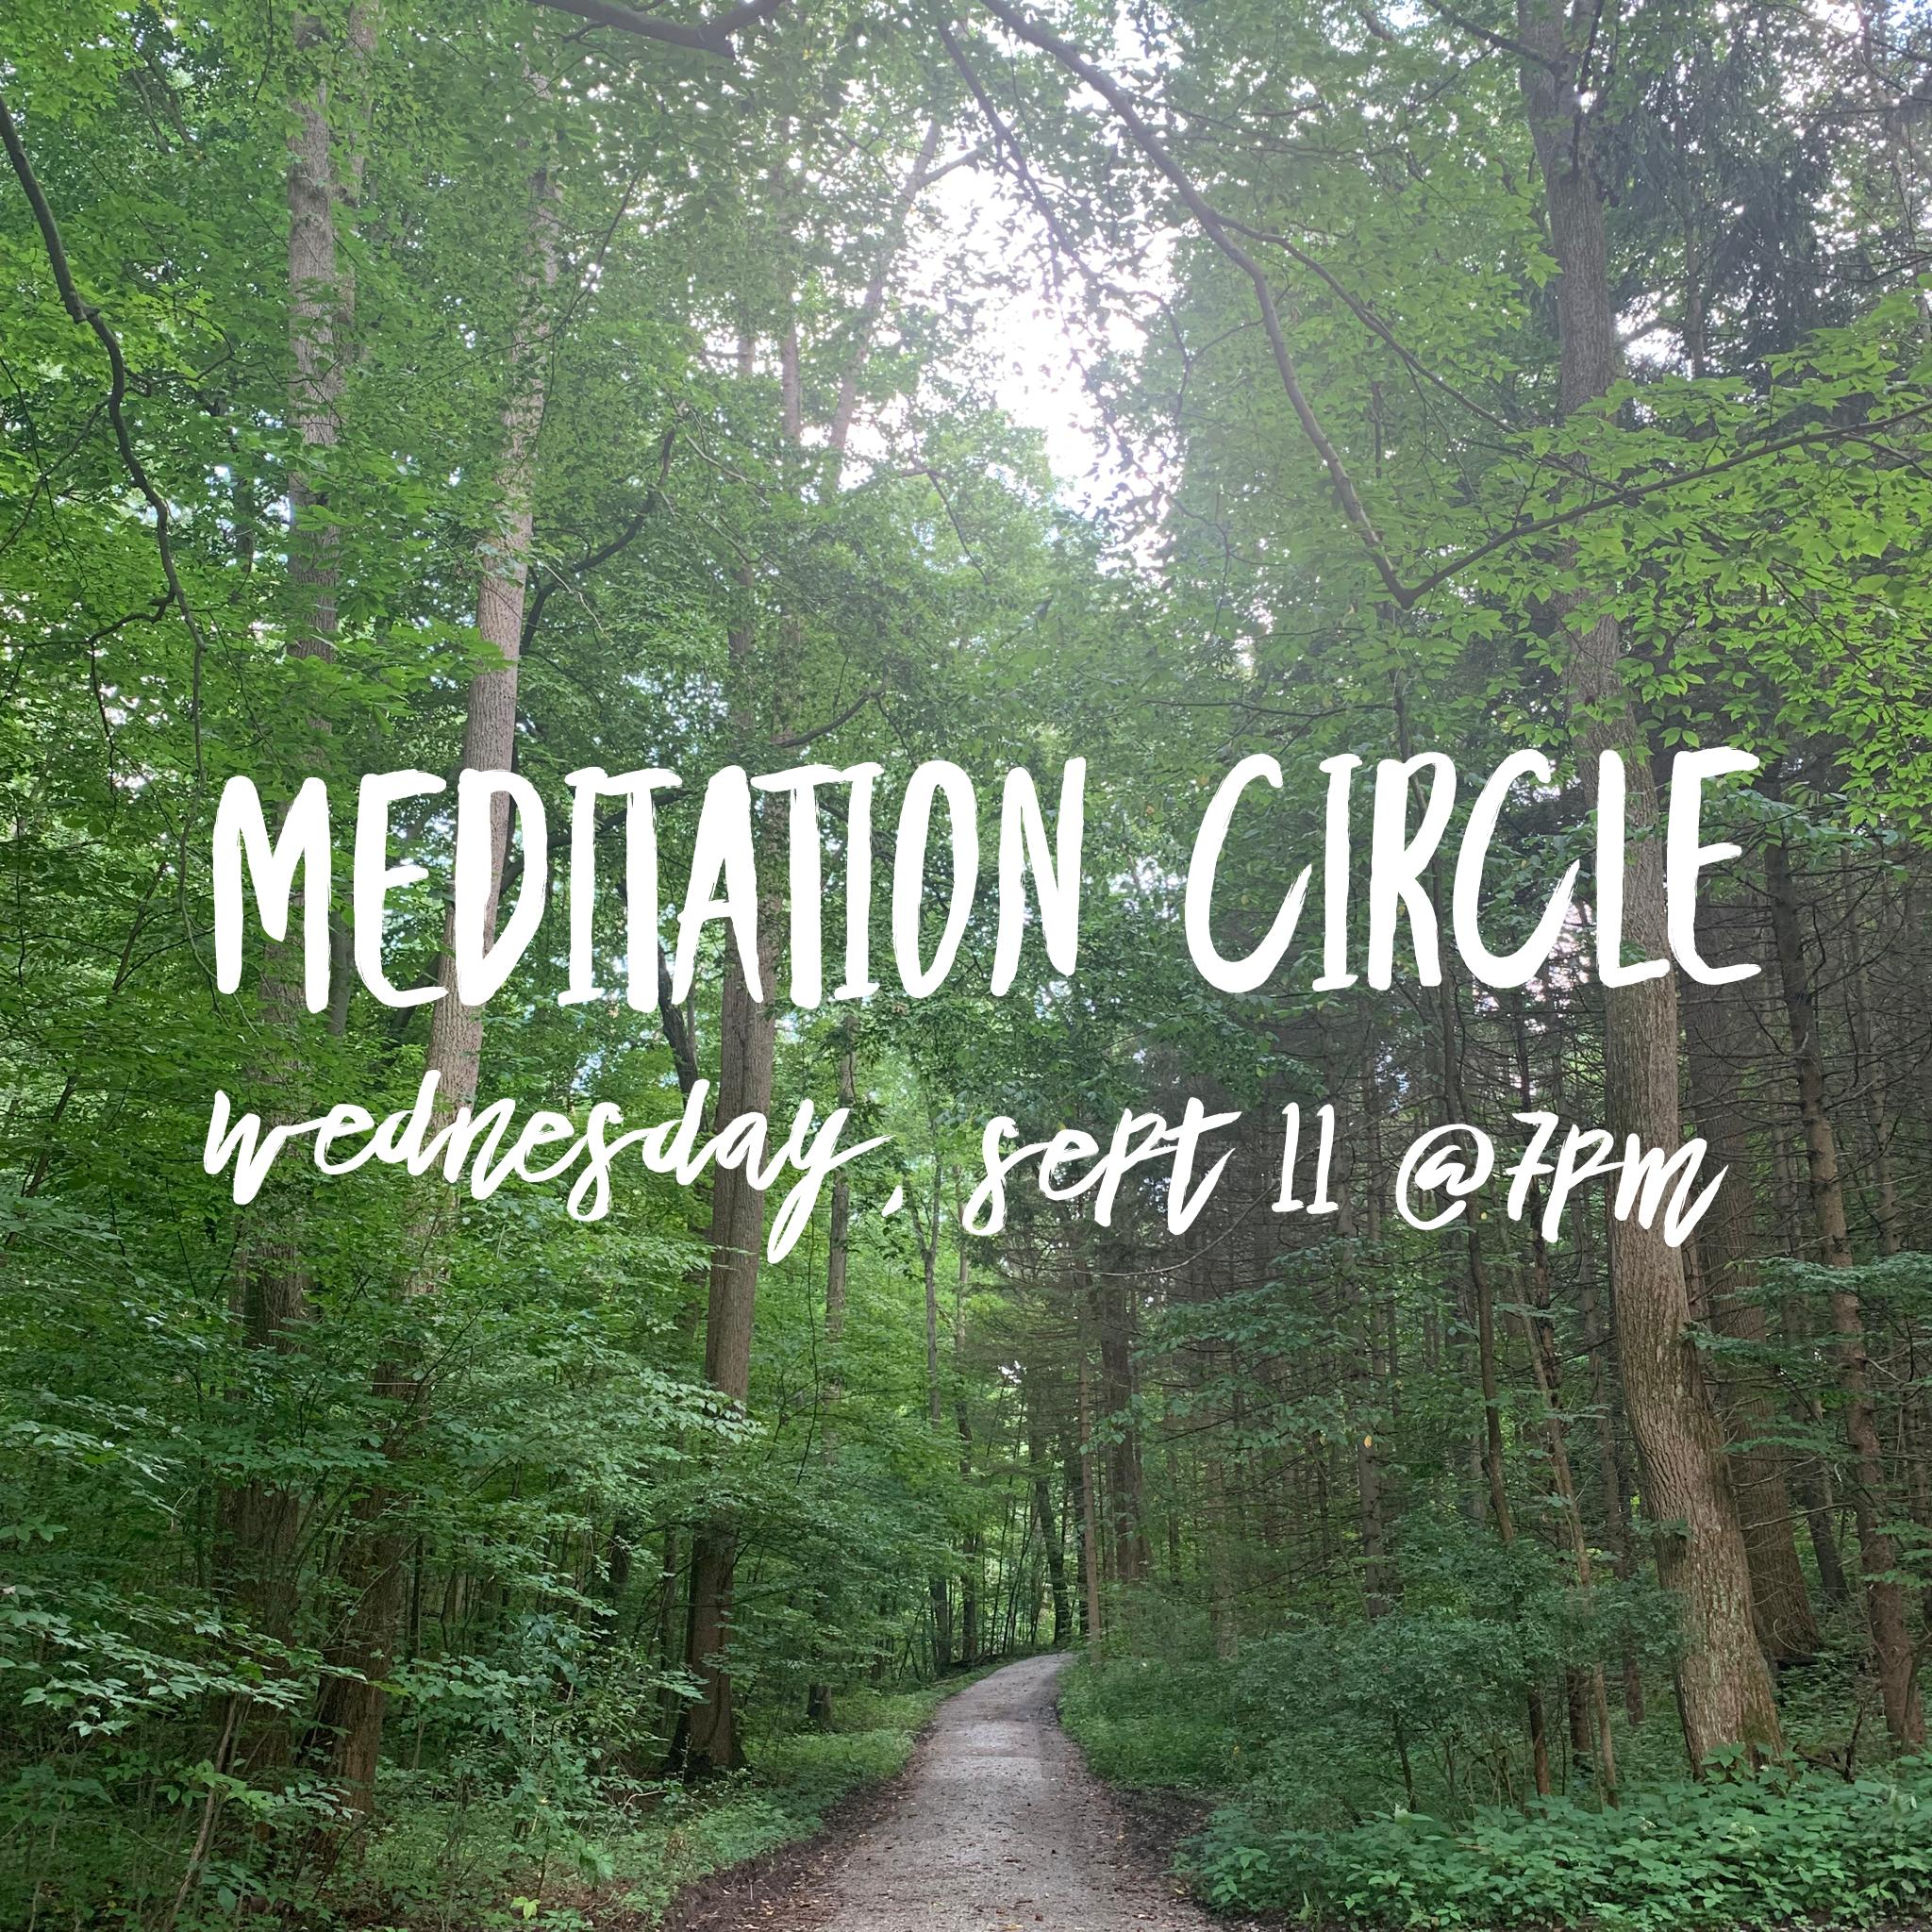 Ligonier Meditation Circle